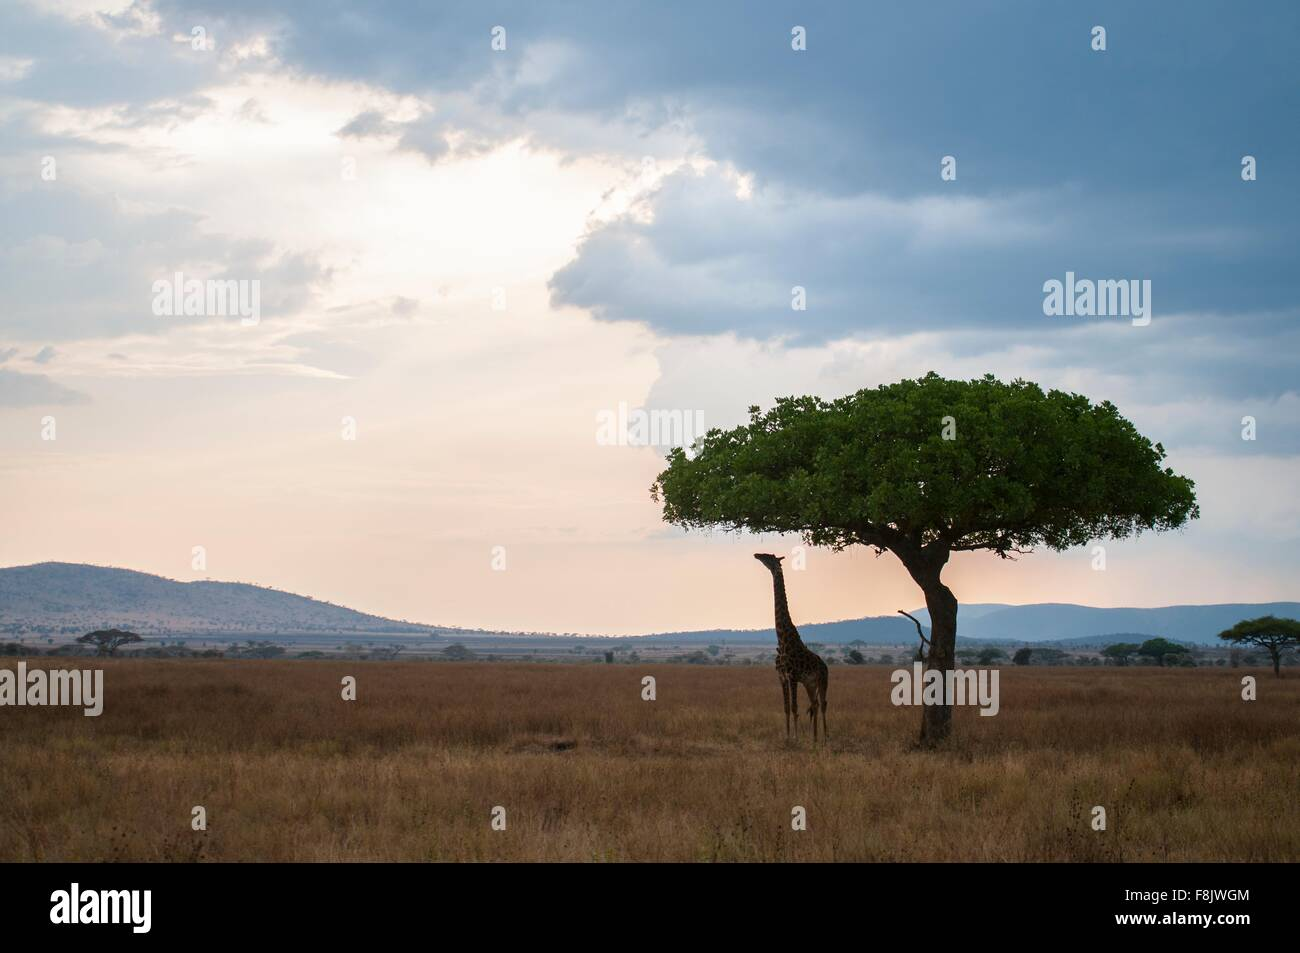 Giraffe reaching for tree leaves at dusk, Masai Mara, Kenya - Stock Image